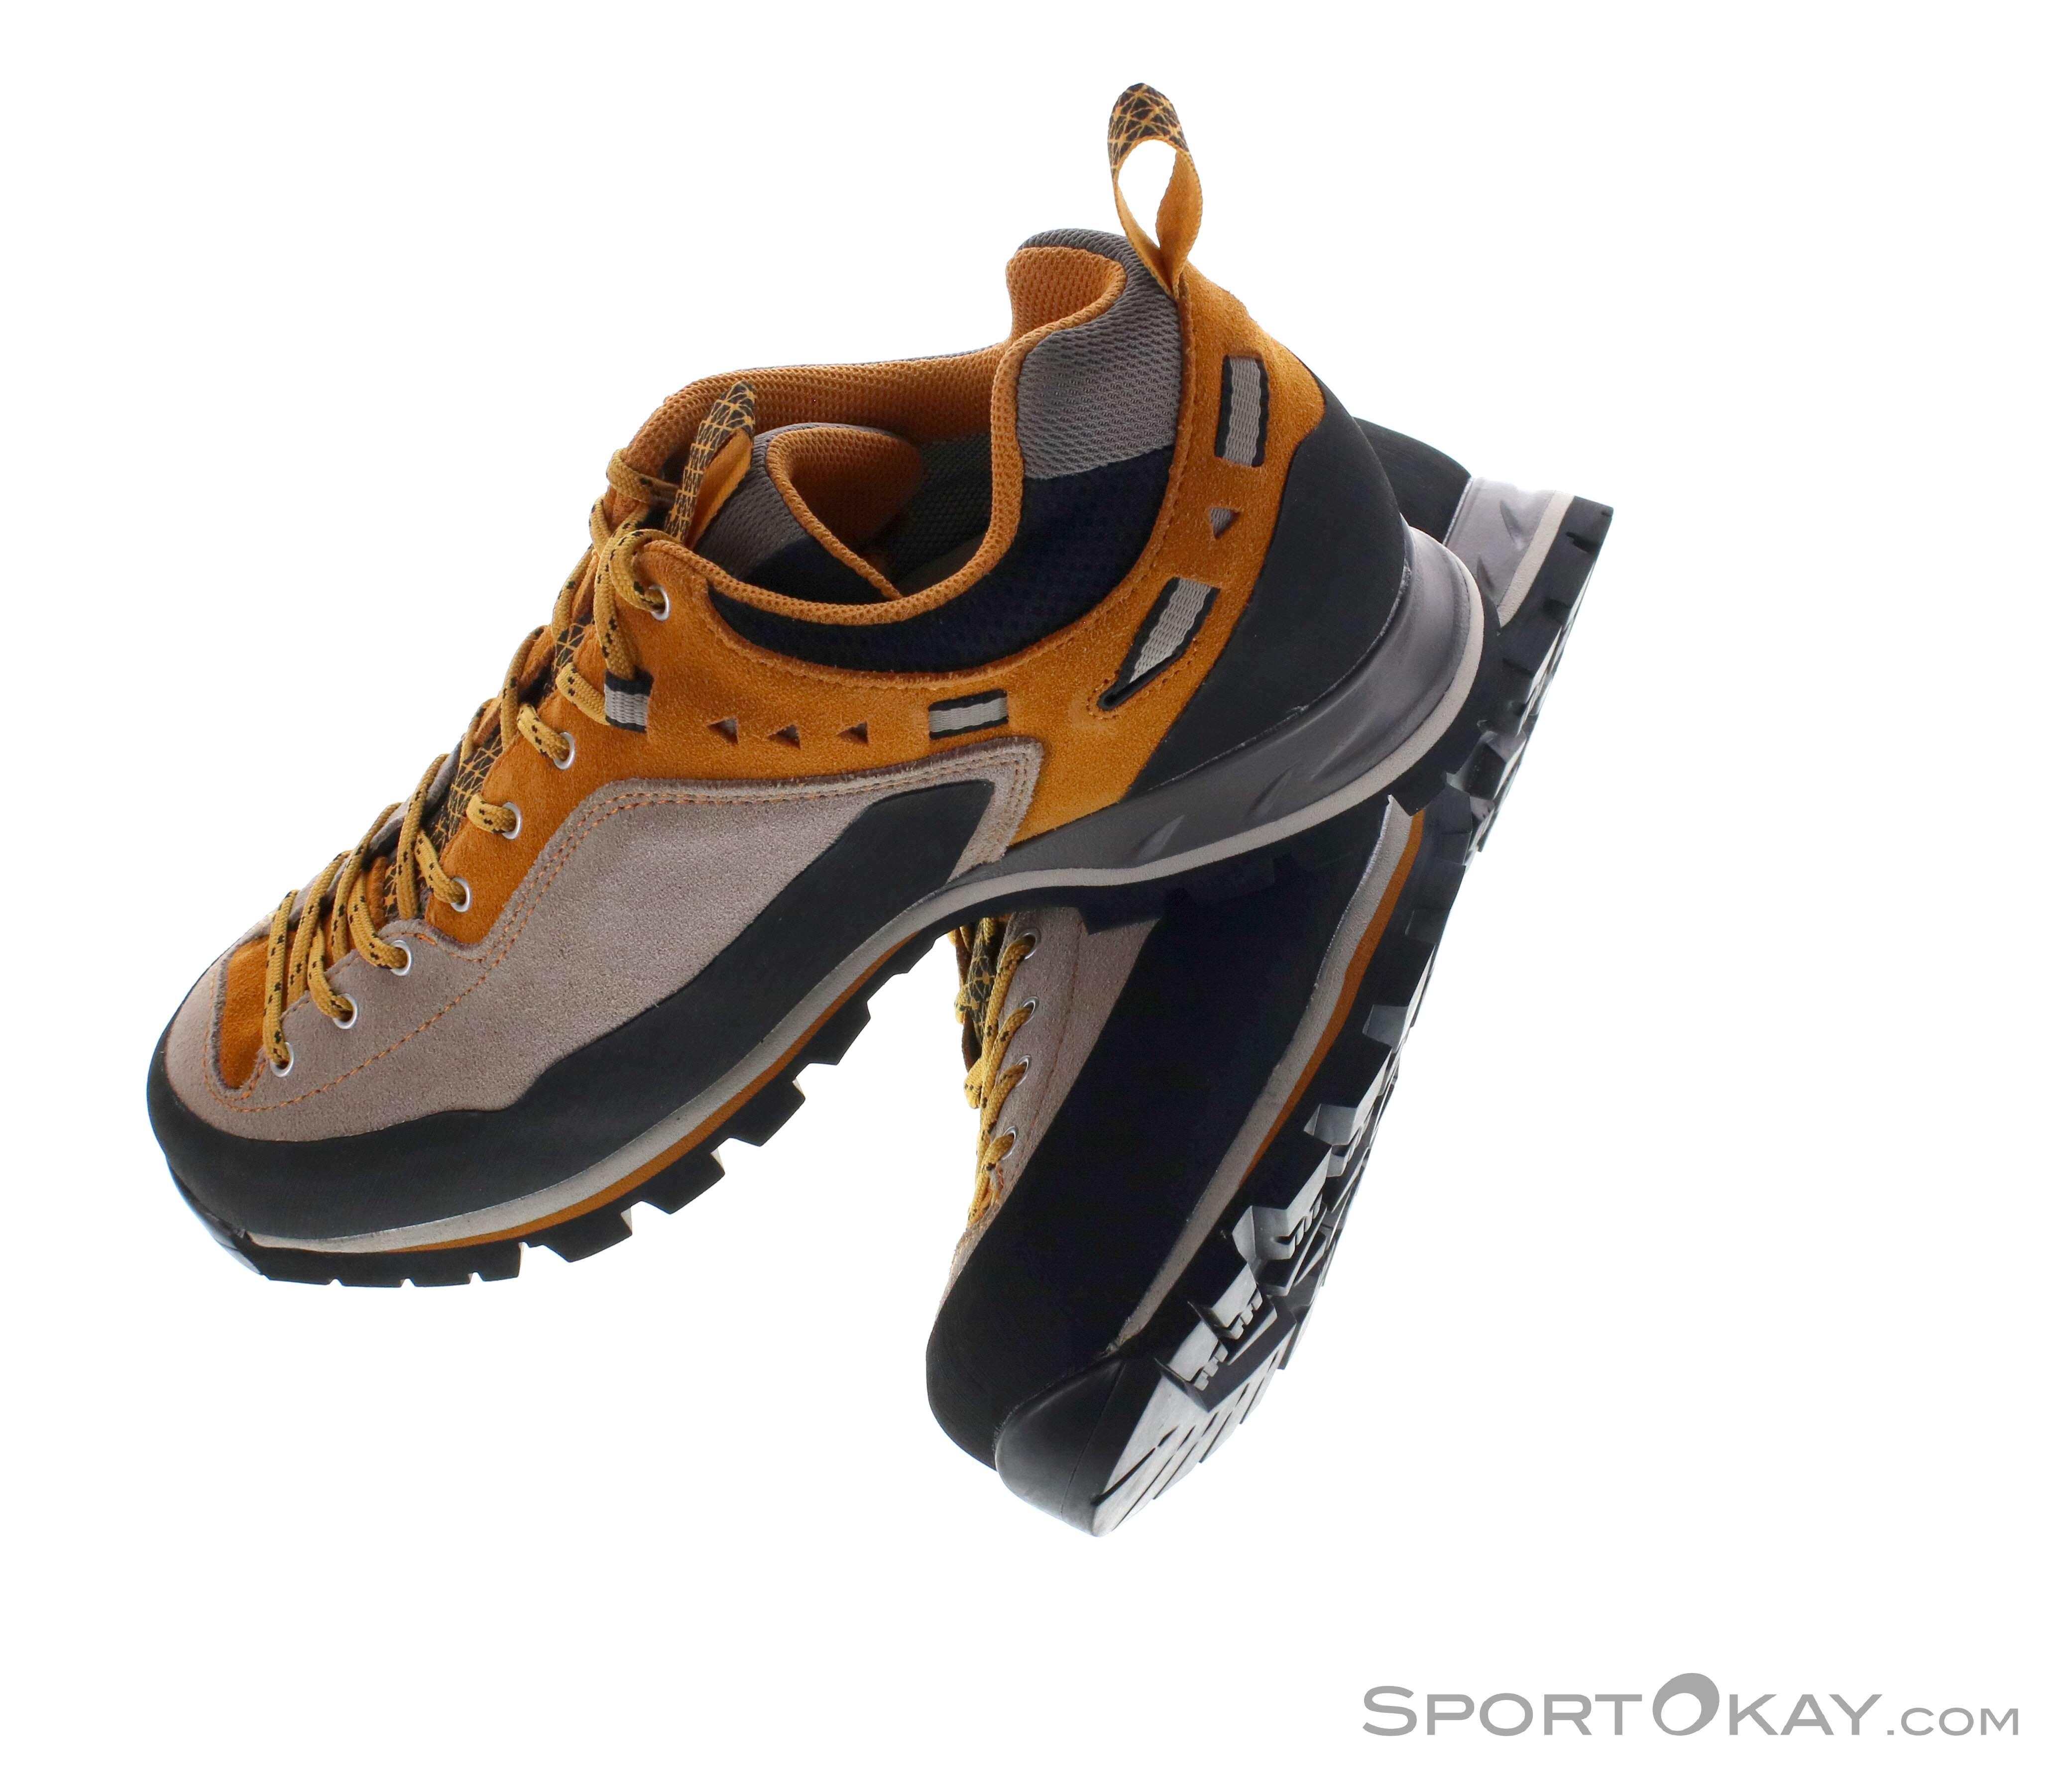 Garmont Garmont Dragontail MNT GTX Trekking Shoes Gore Tex